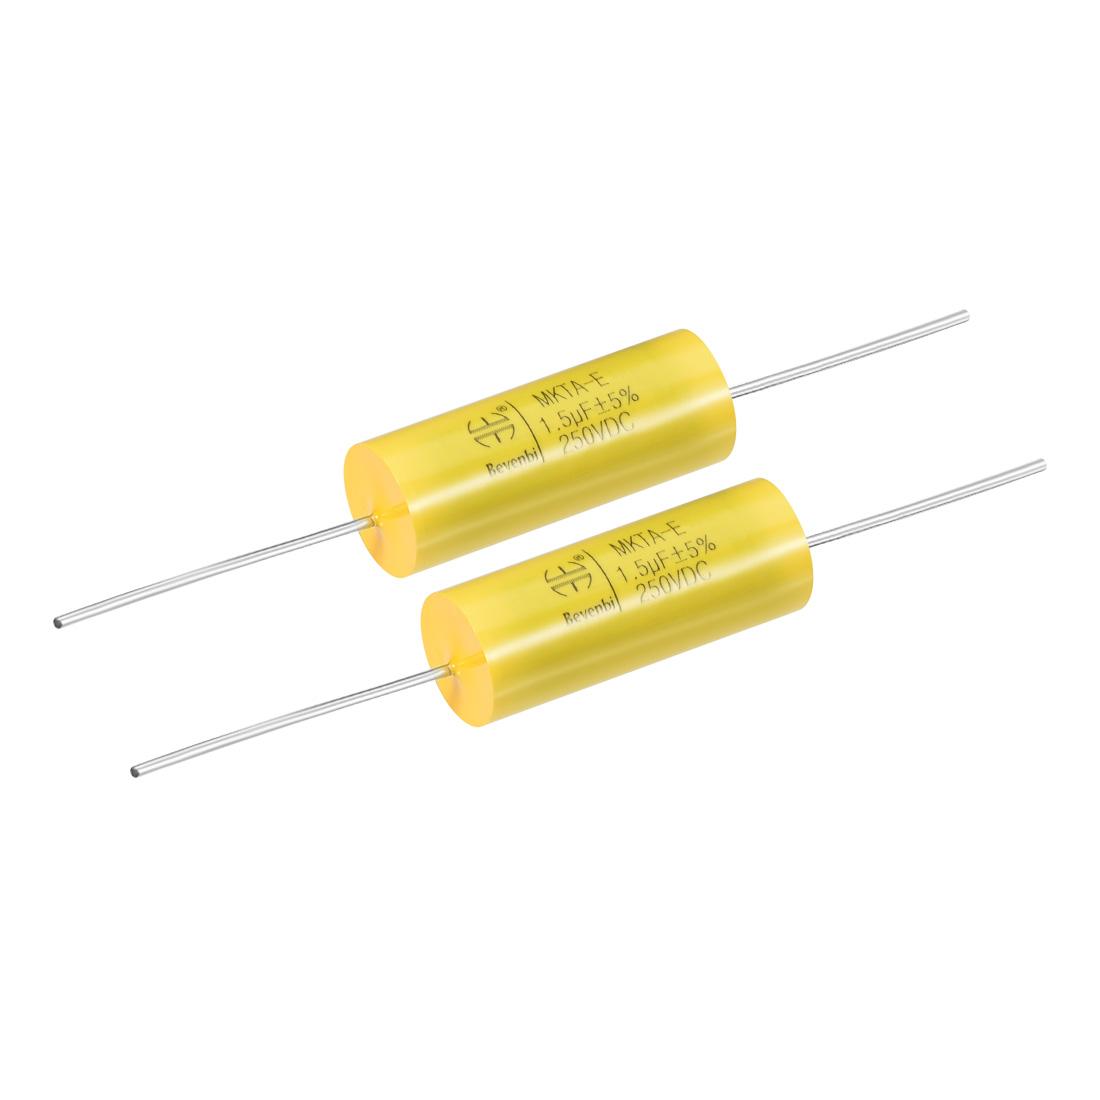 Film Capacitor 250V DC 1.5uF MKTA-E Round Polypropylene Capacitors Yellow 2pcs